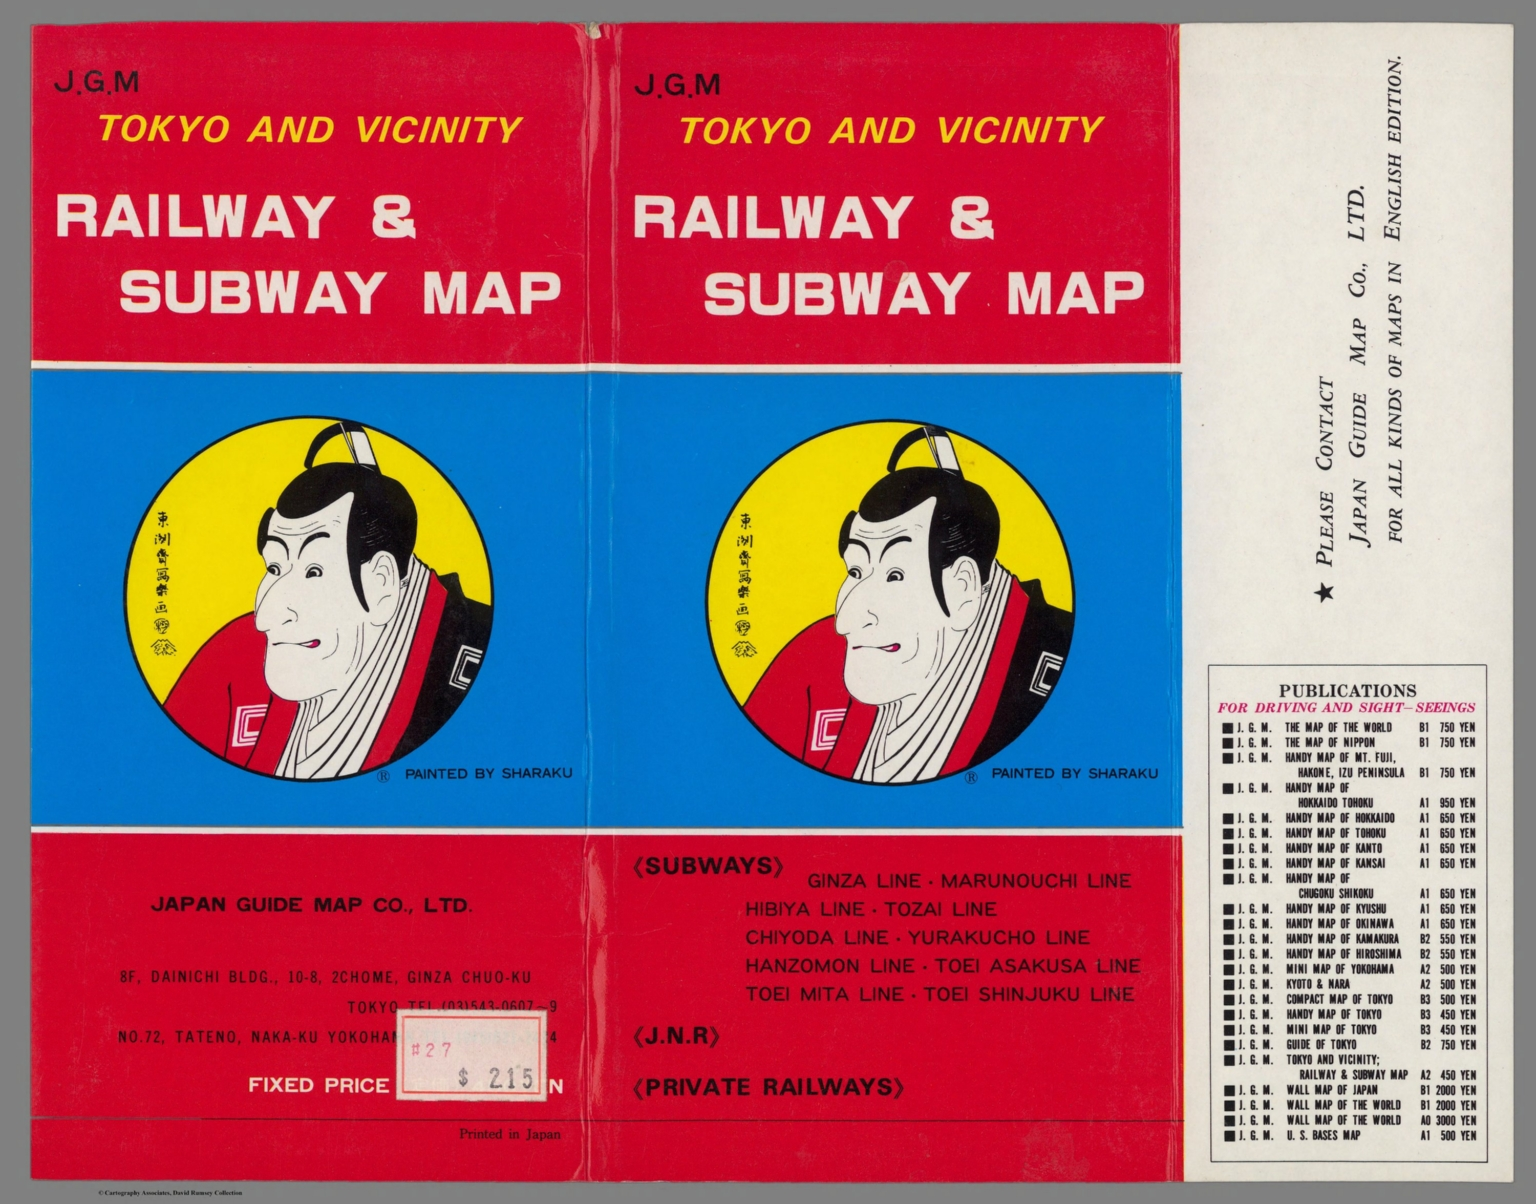 Subway Map For All Of Tokyo English.Covers J G M Tokyo And Vicinity Railway Subway Map David